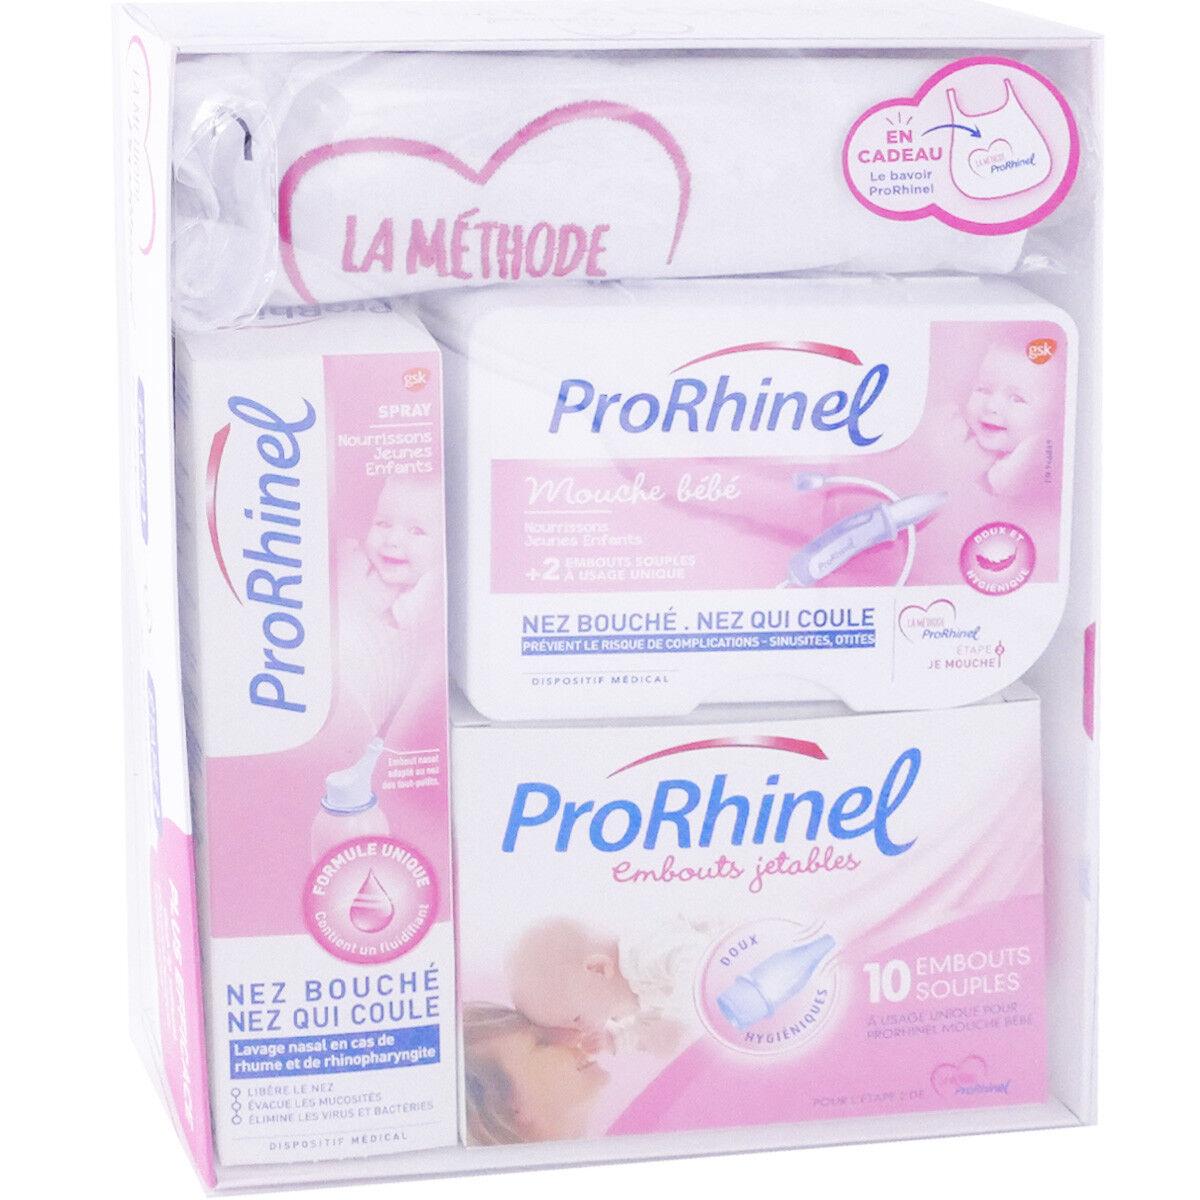 GSK Prorhinel coffret 3 soins + 1 bavoir offert